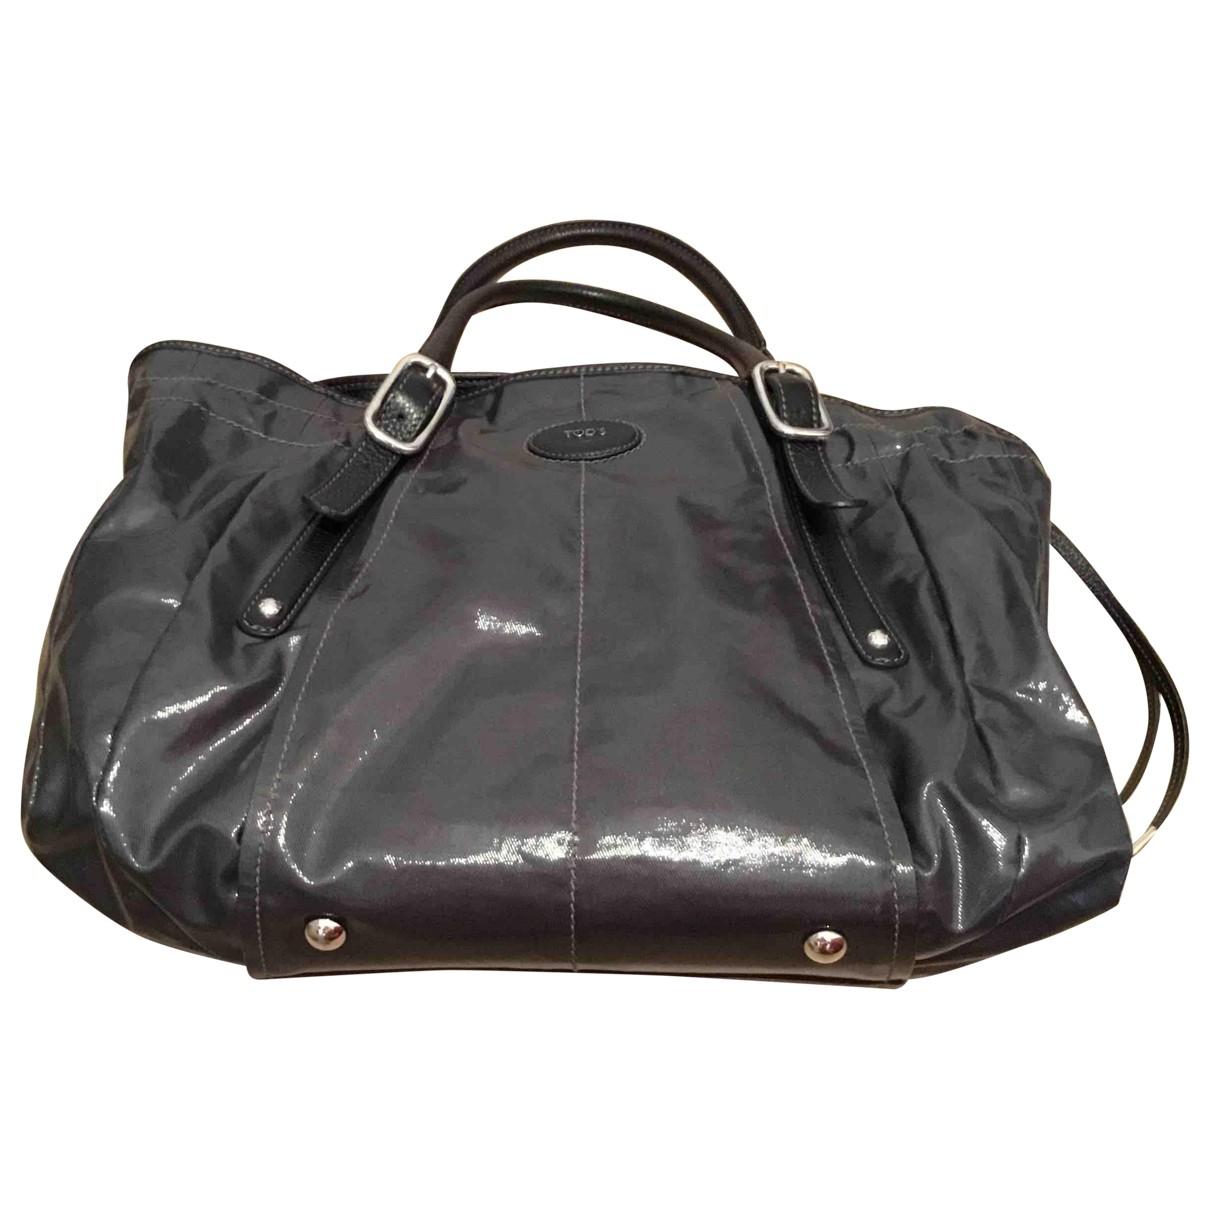 Tod's \N Handtasche in  Grau Lackleder